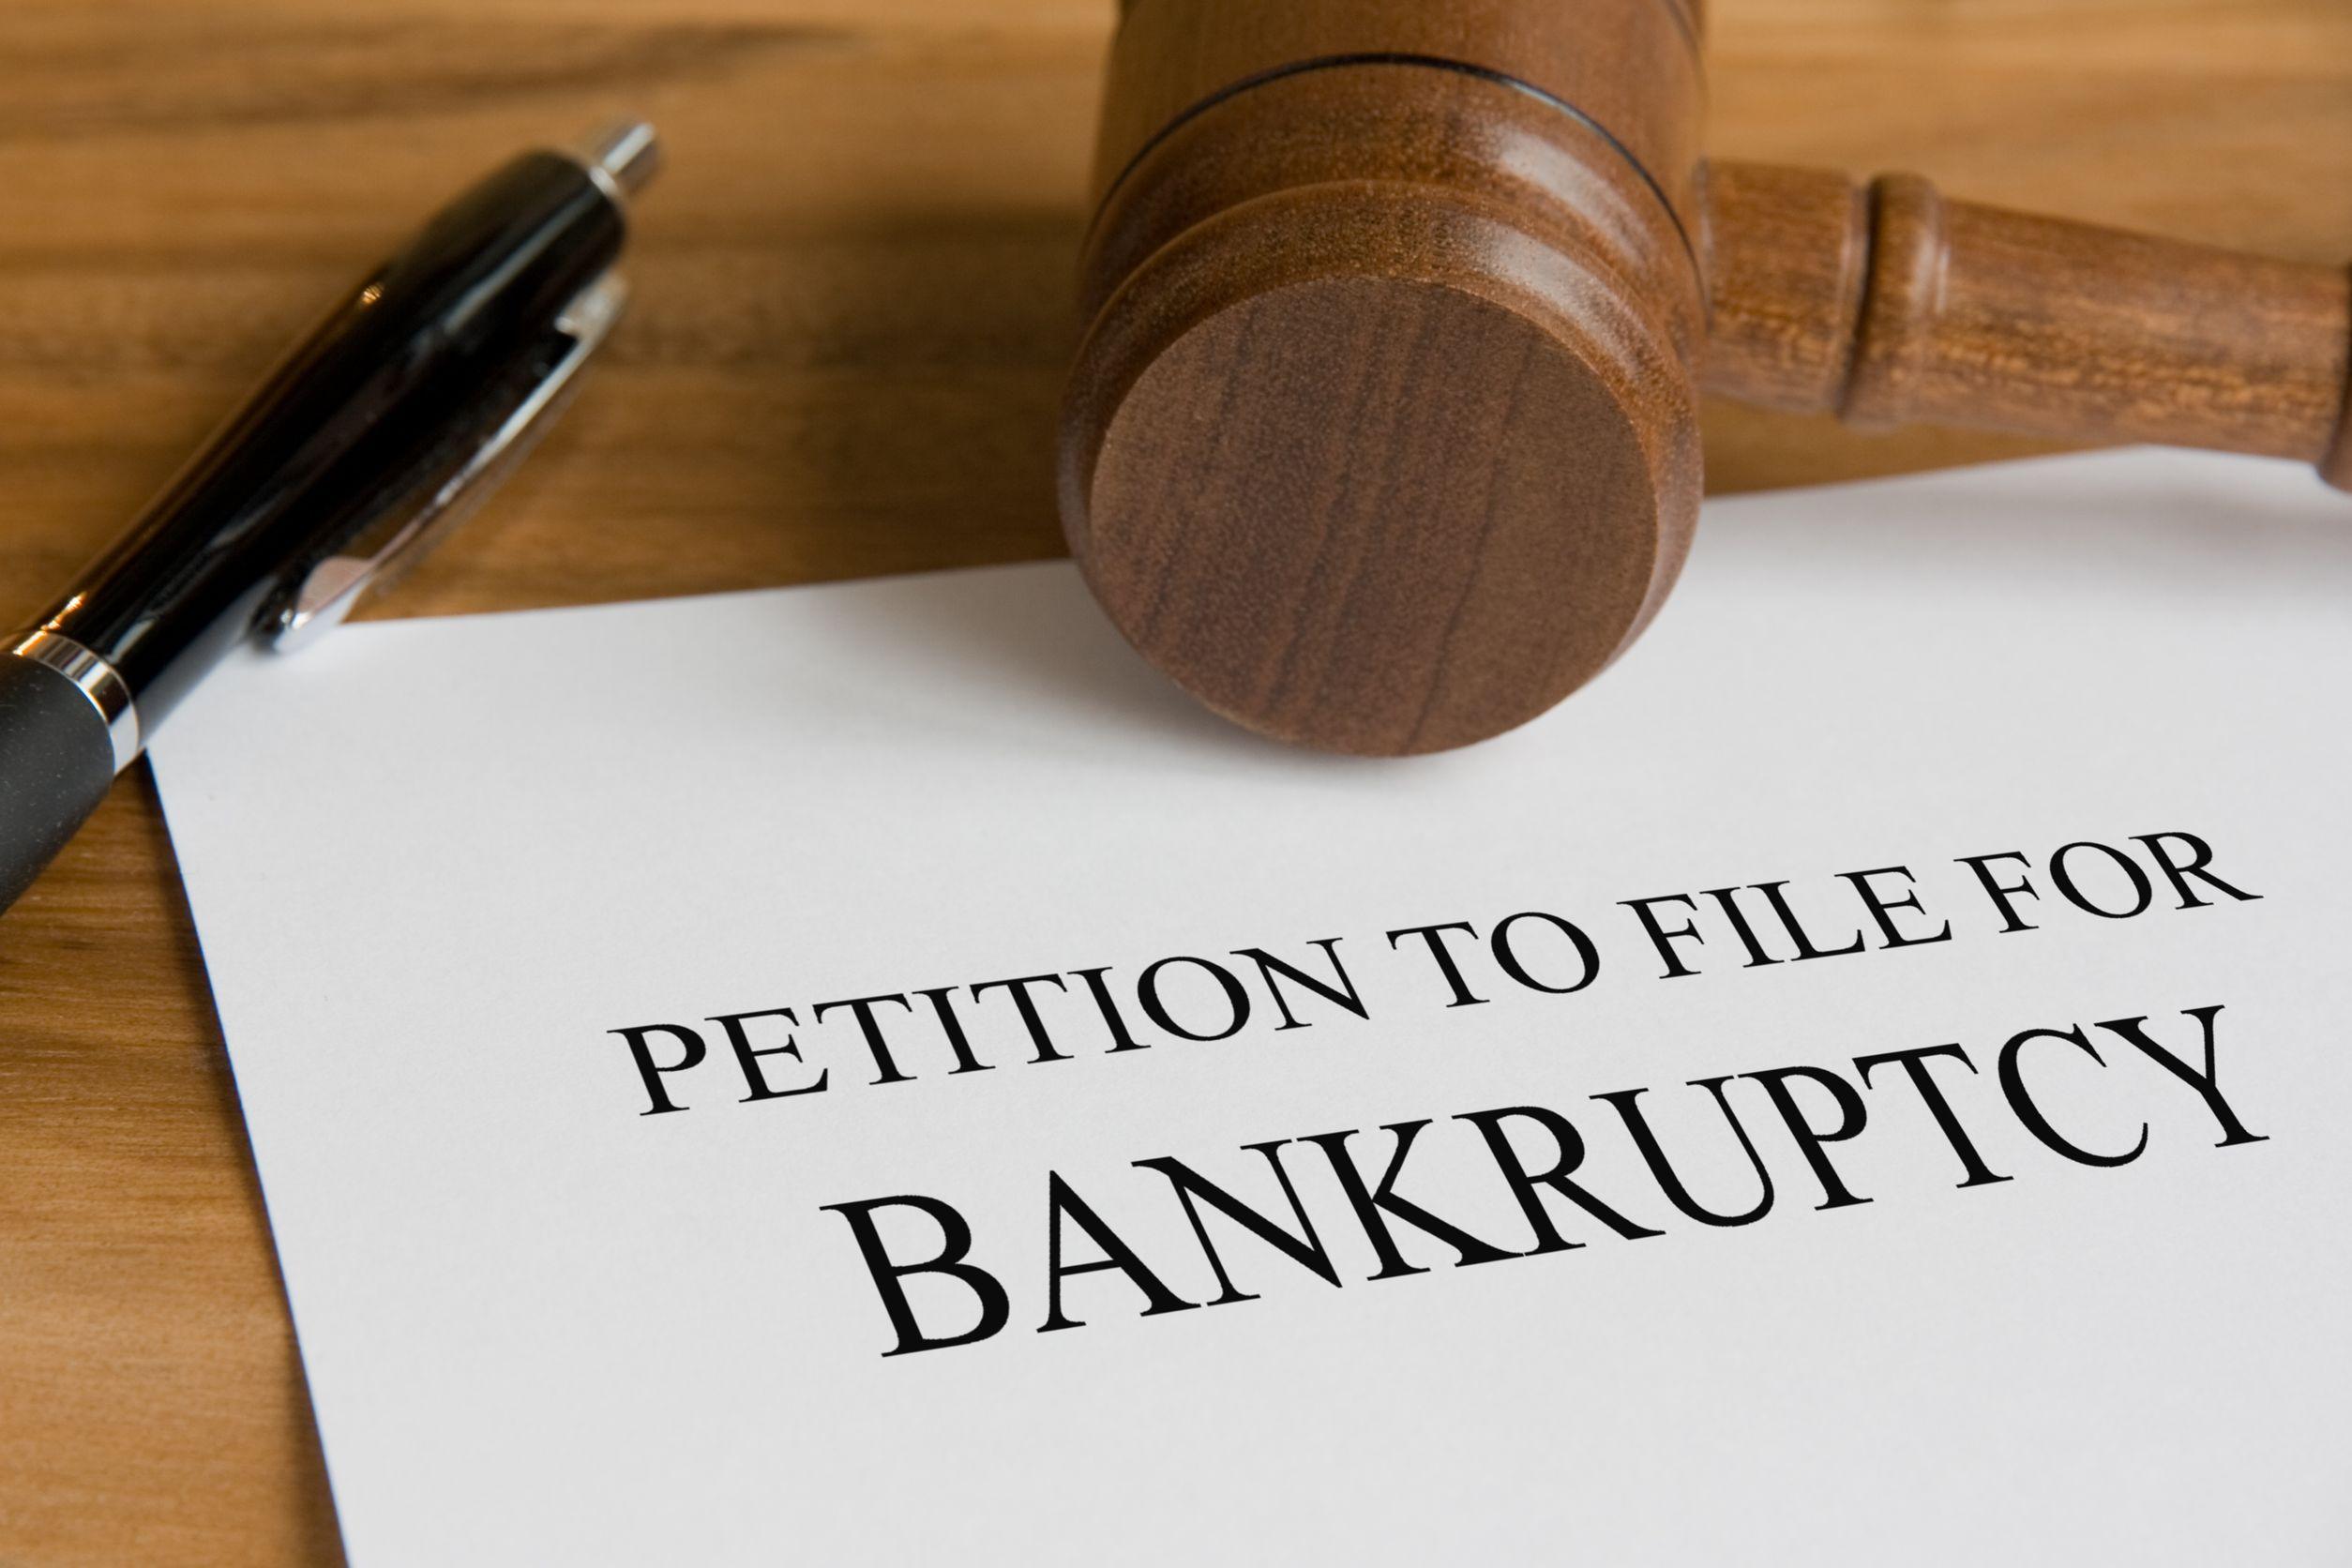 Bankruptcy appraiser photo